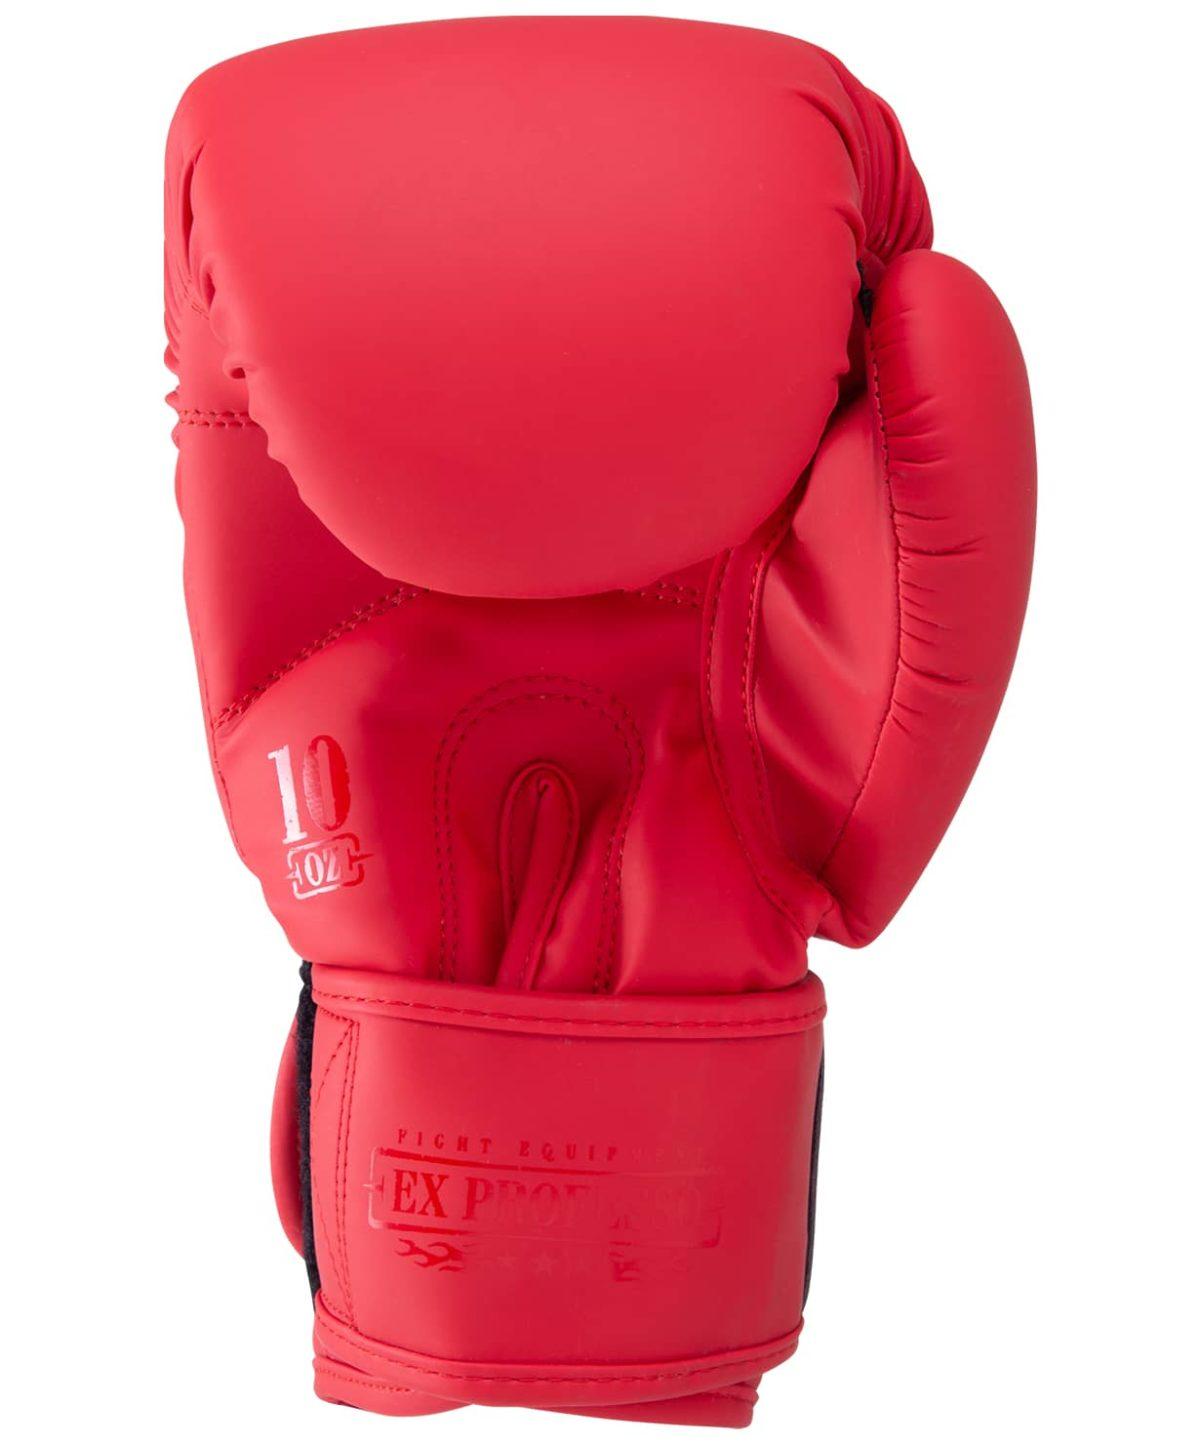 FIGHT EXPERT Перчатки боксерские 10 oz  BGS-V010: красный - 4